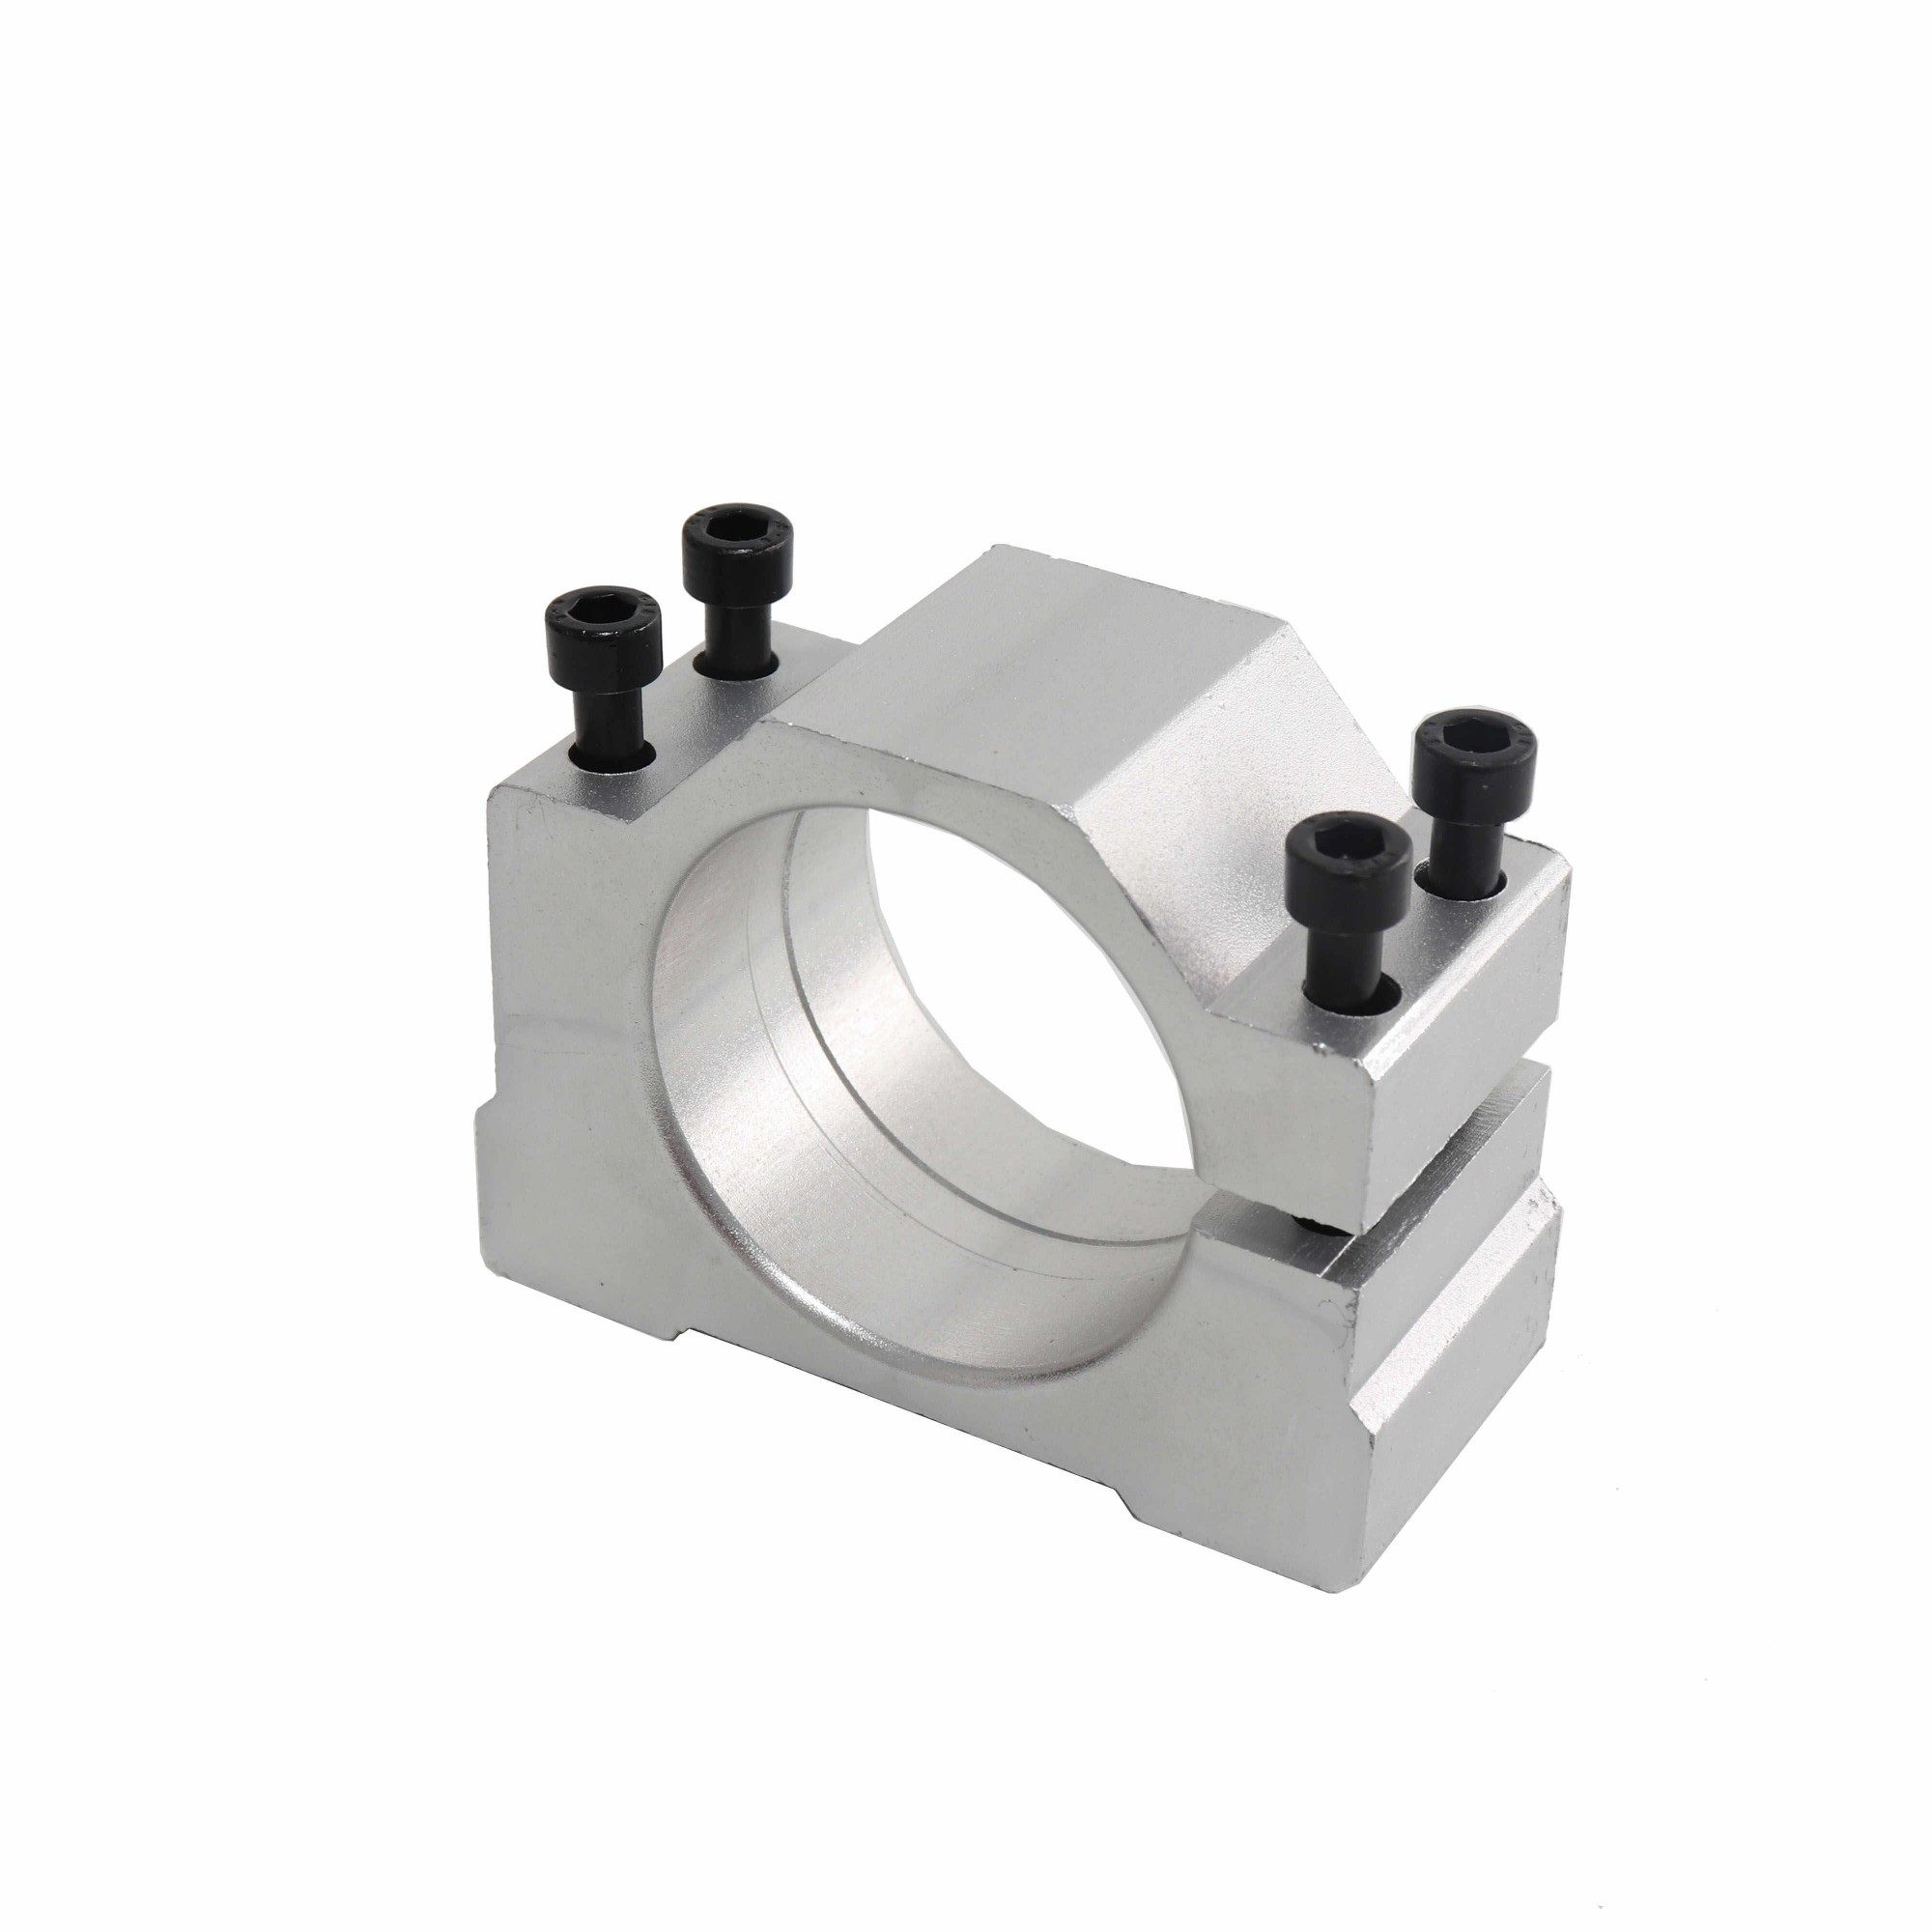 Suporte Para Motor Spindle Cnc 52mm